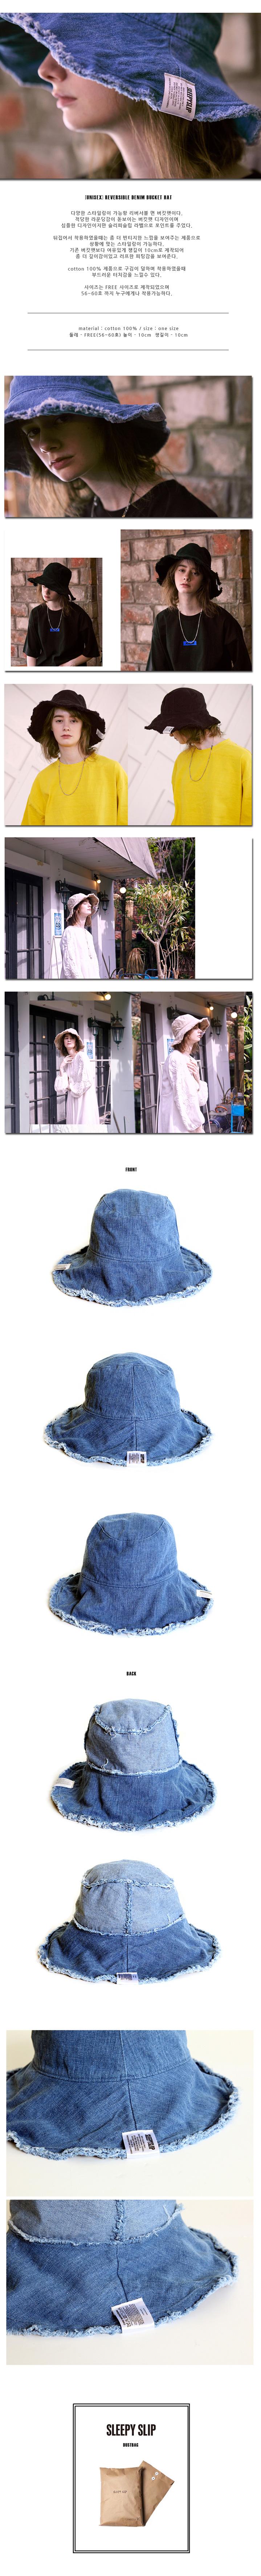 reversible-.denim-bucket-hat.jpg